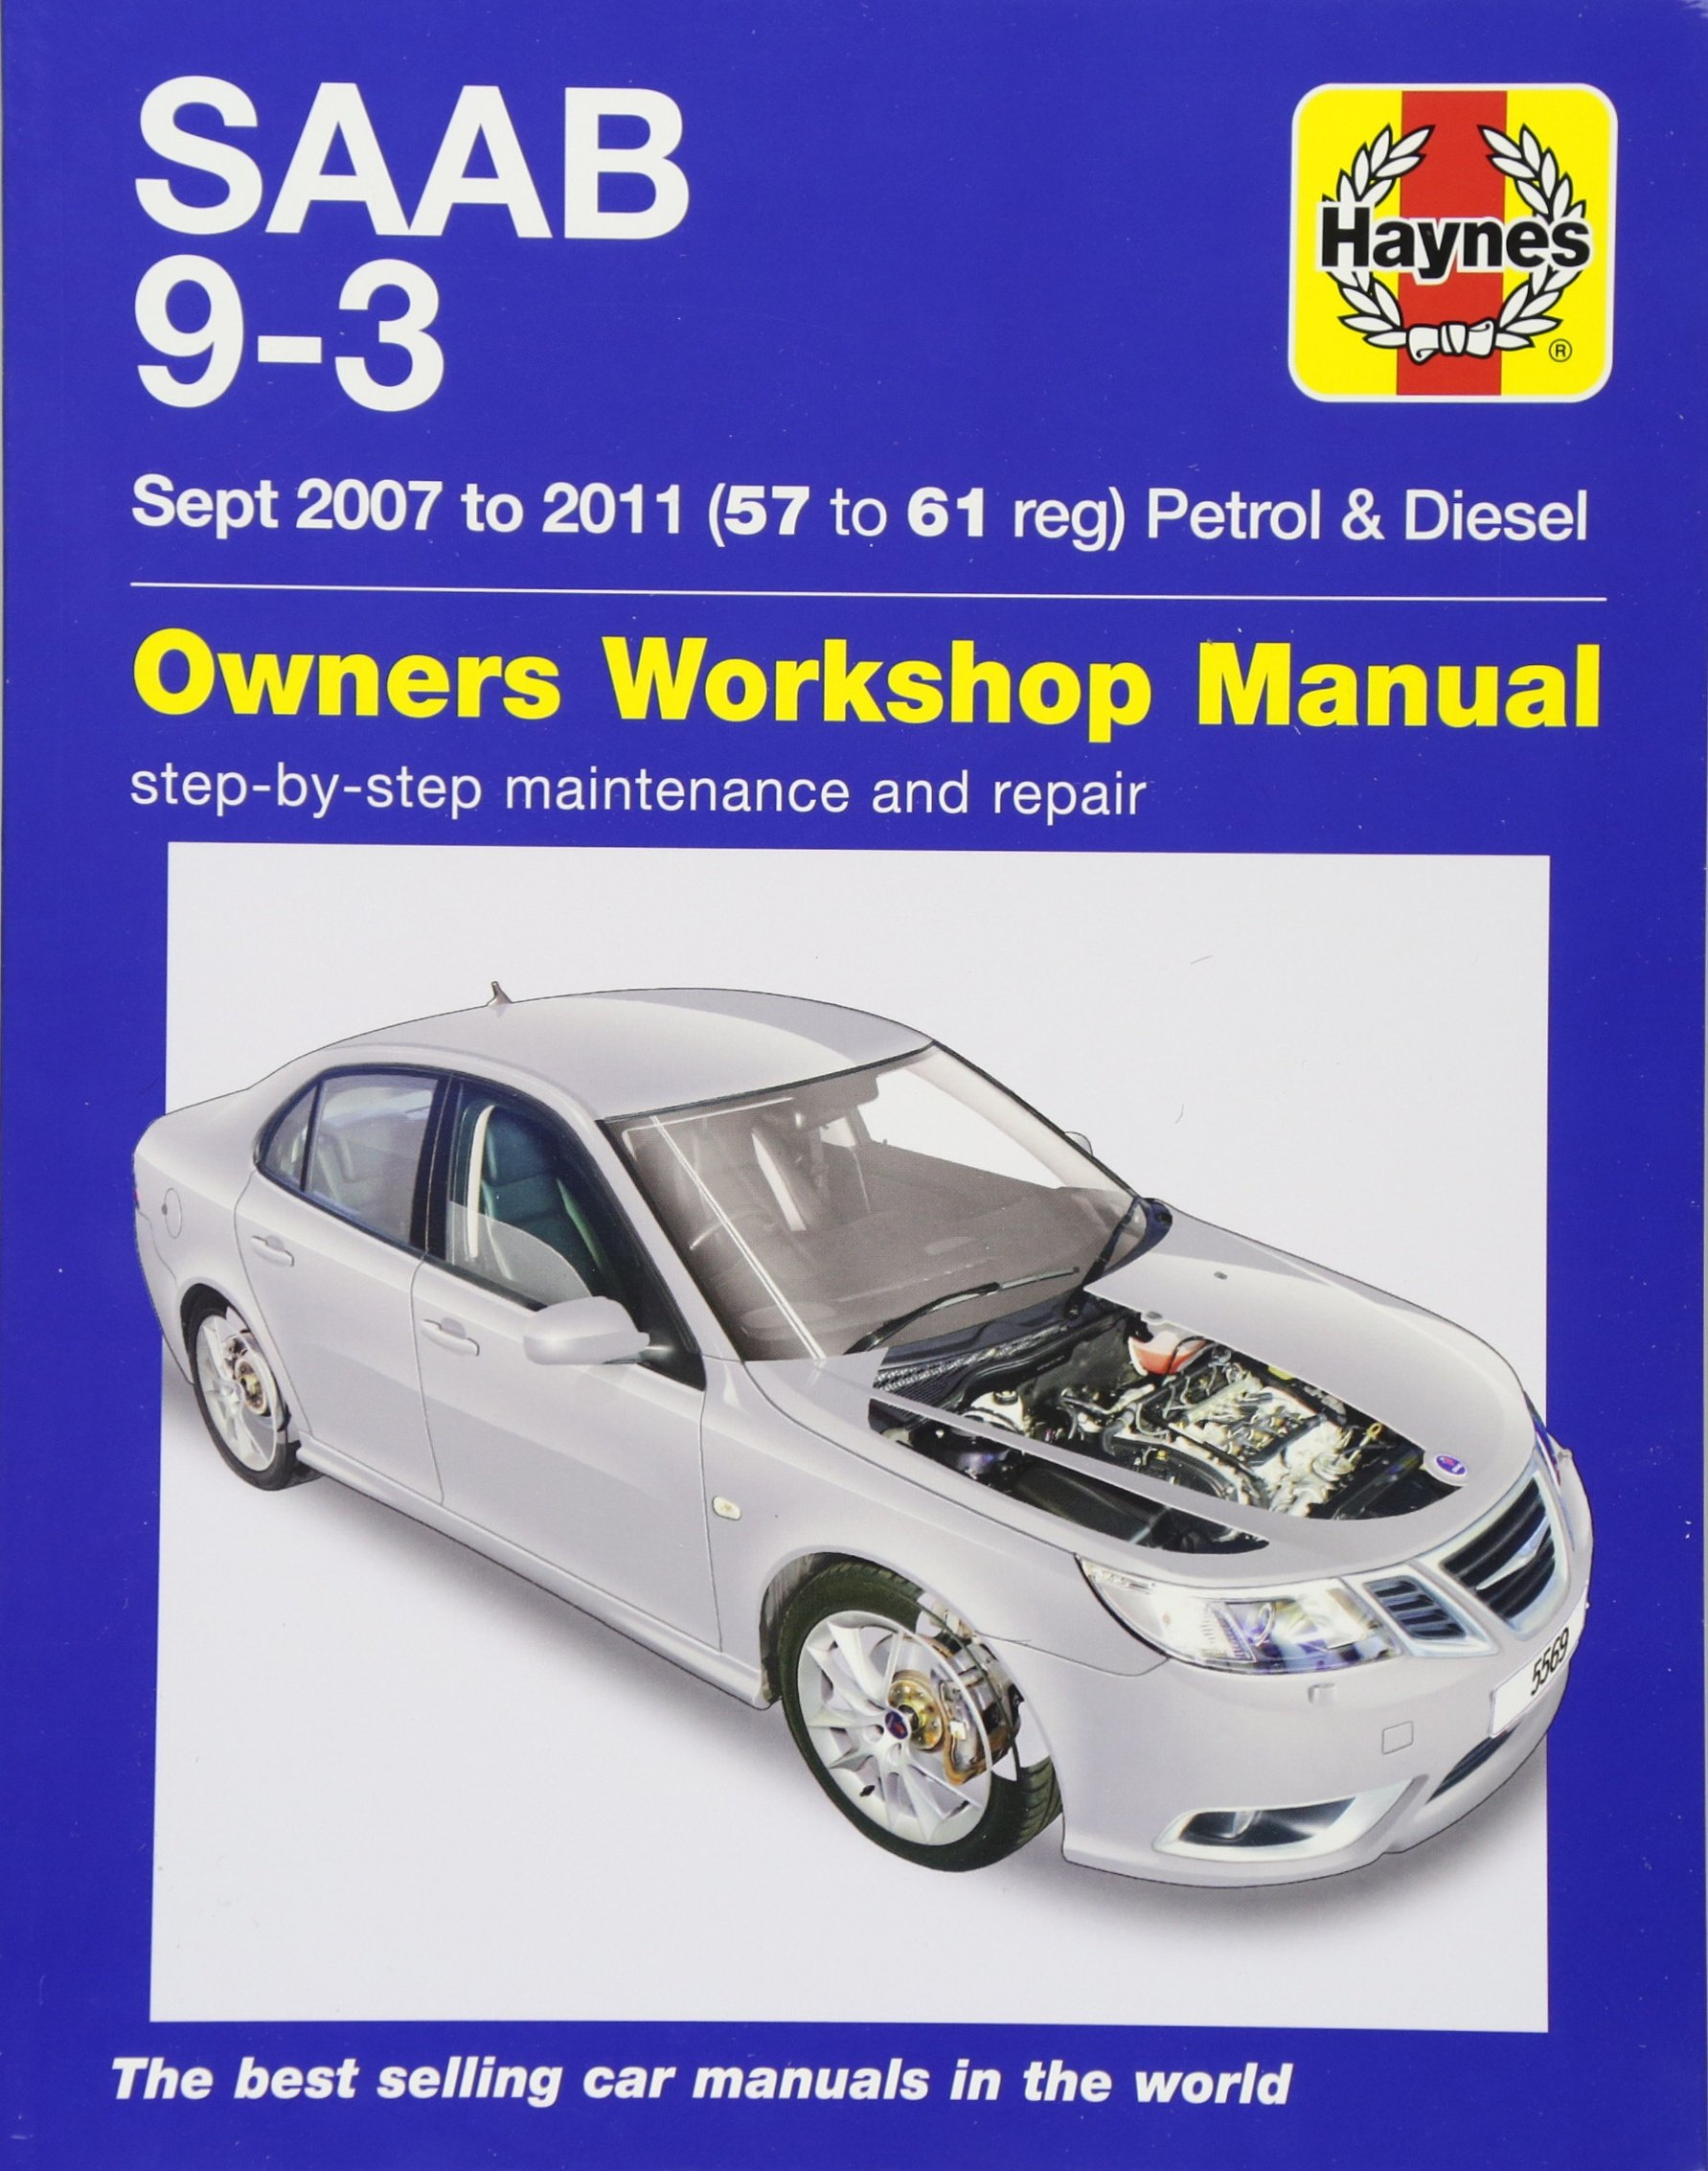 Saab 9-3 Petrol And Diesel Owners Workshop Manual: 2007-2011: Haynes  Publishing: 9781785213724: Amazon.com: Books